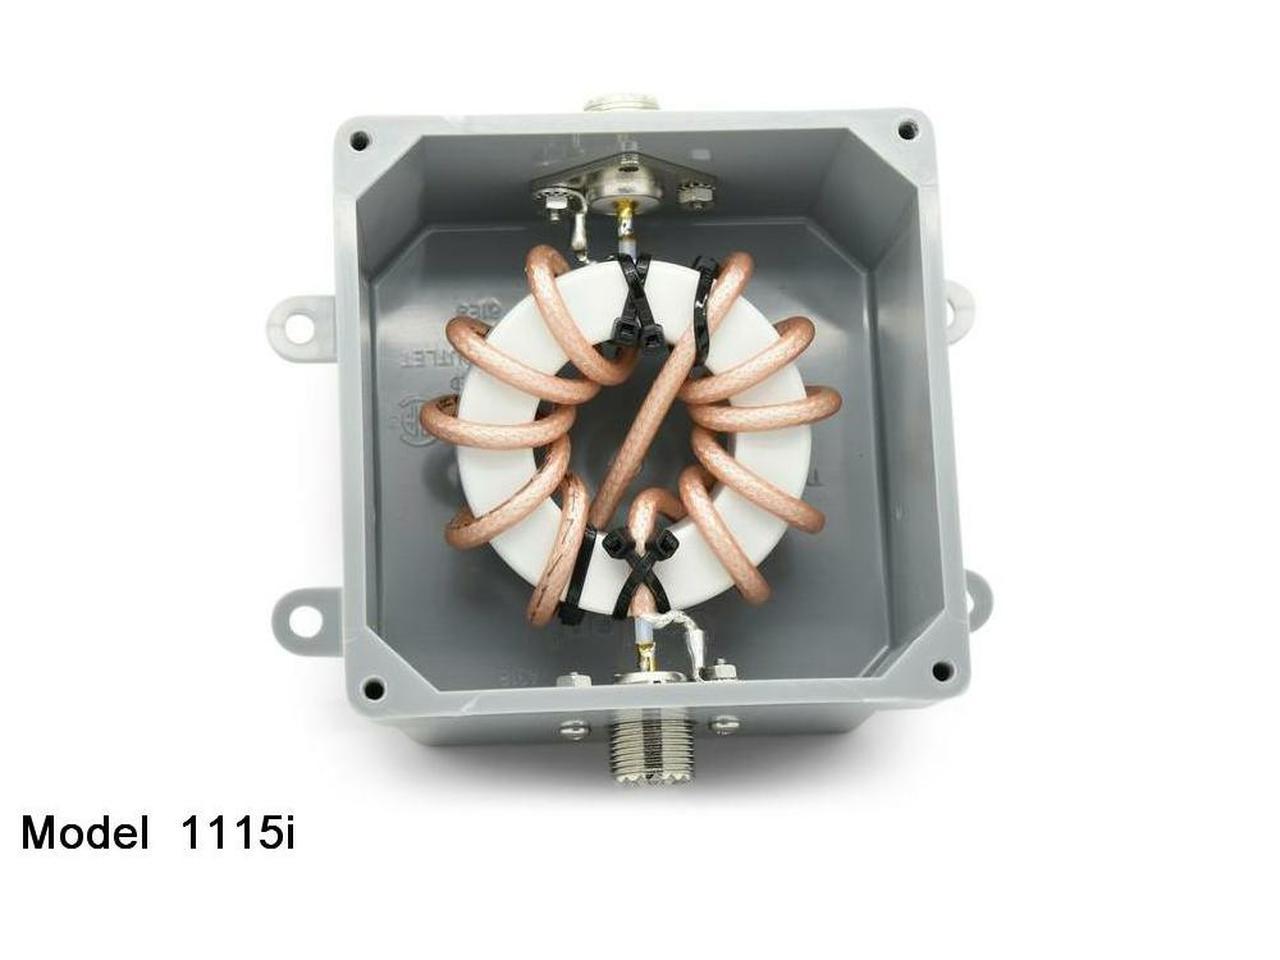 1115i - 1:1 Single Core Isolation Balun, 1.5-54 Mhz